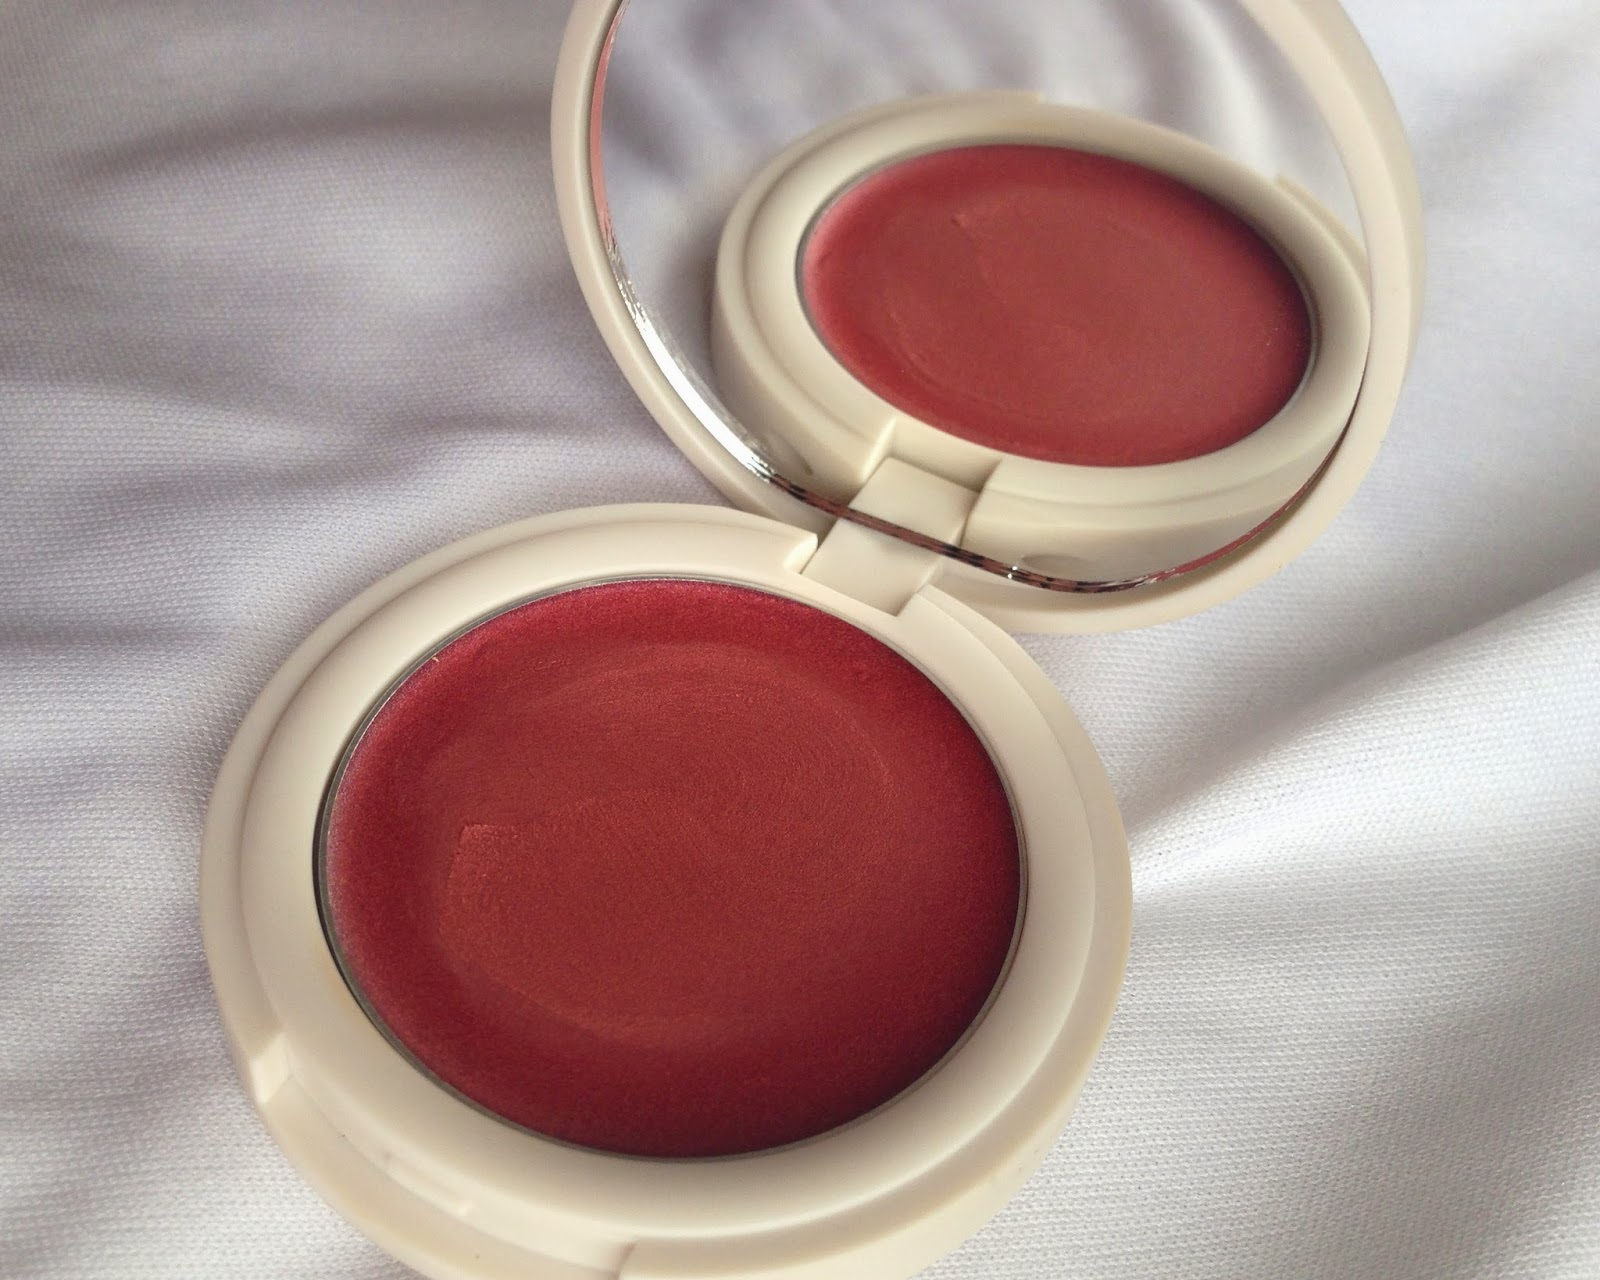 Topshop Cream Blush 'Aorta'